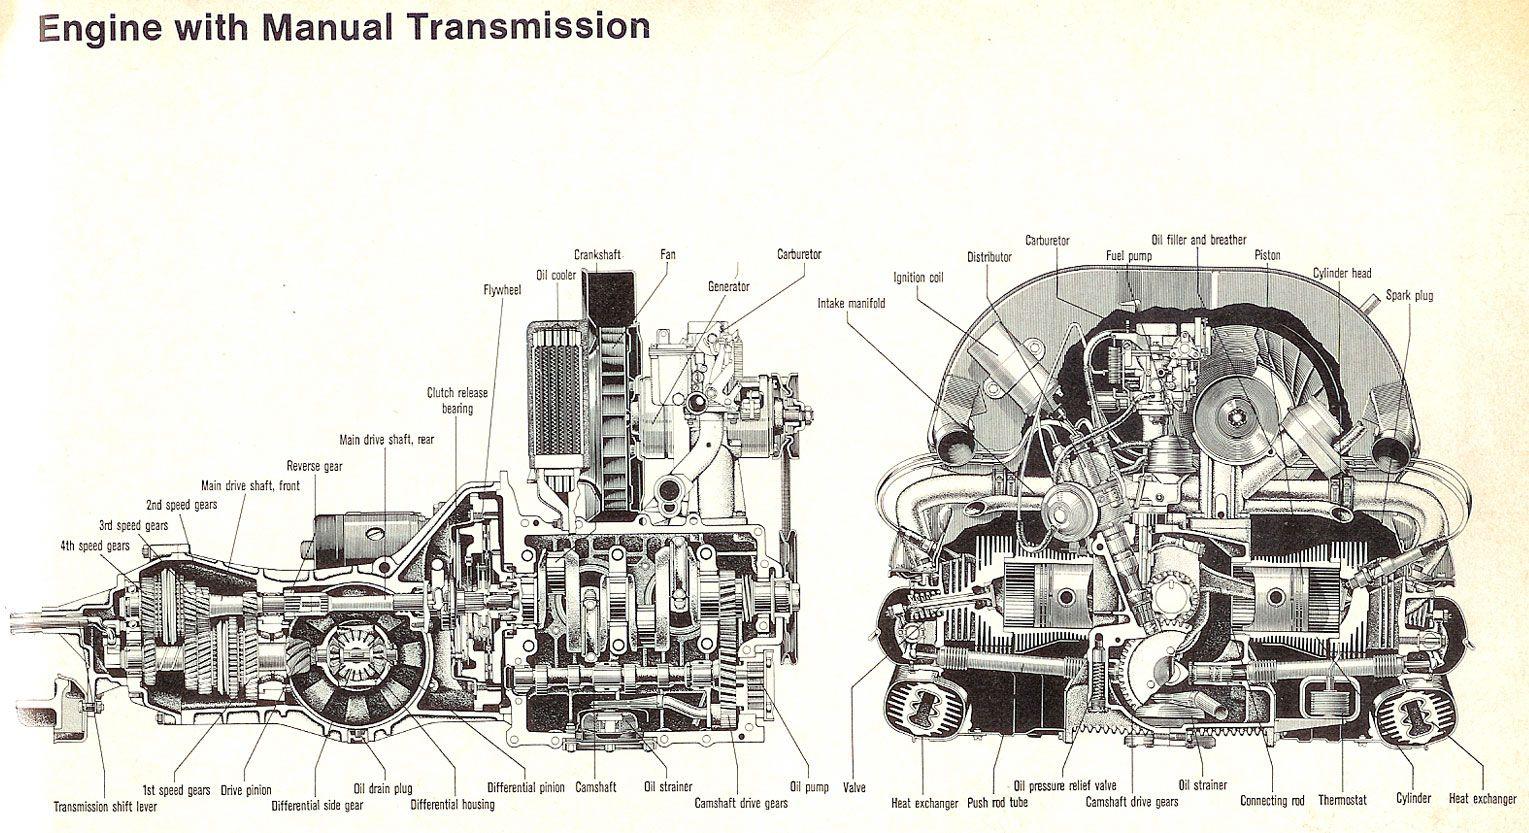 medium resolution of 1974 vw engine diagram schematic wiring diagrams vw alternator wiring diagram 1974 vw engine diagram wiring